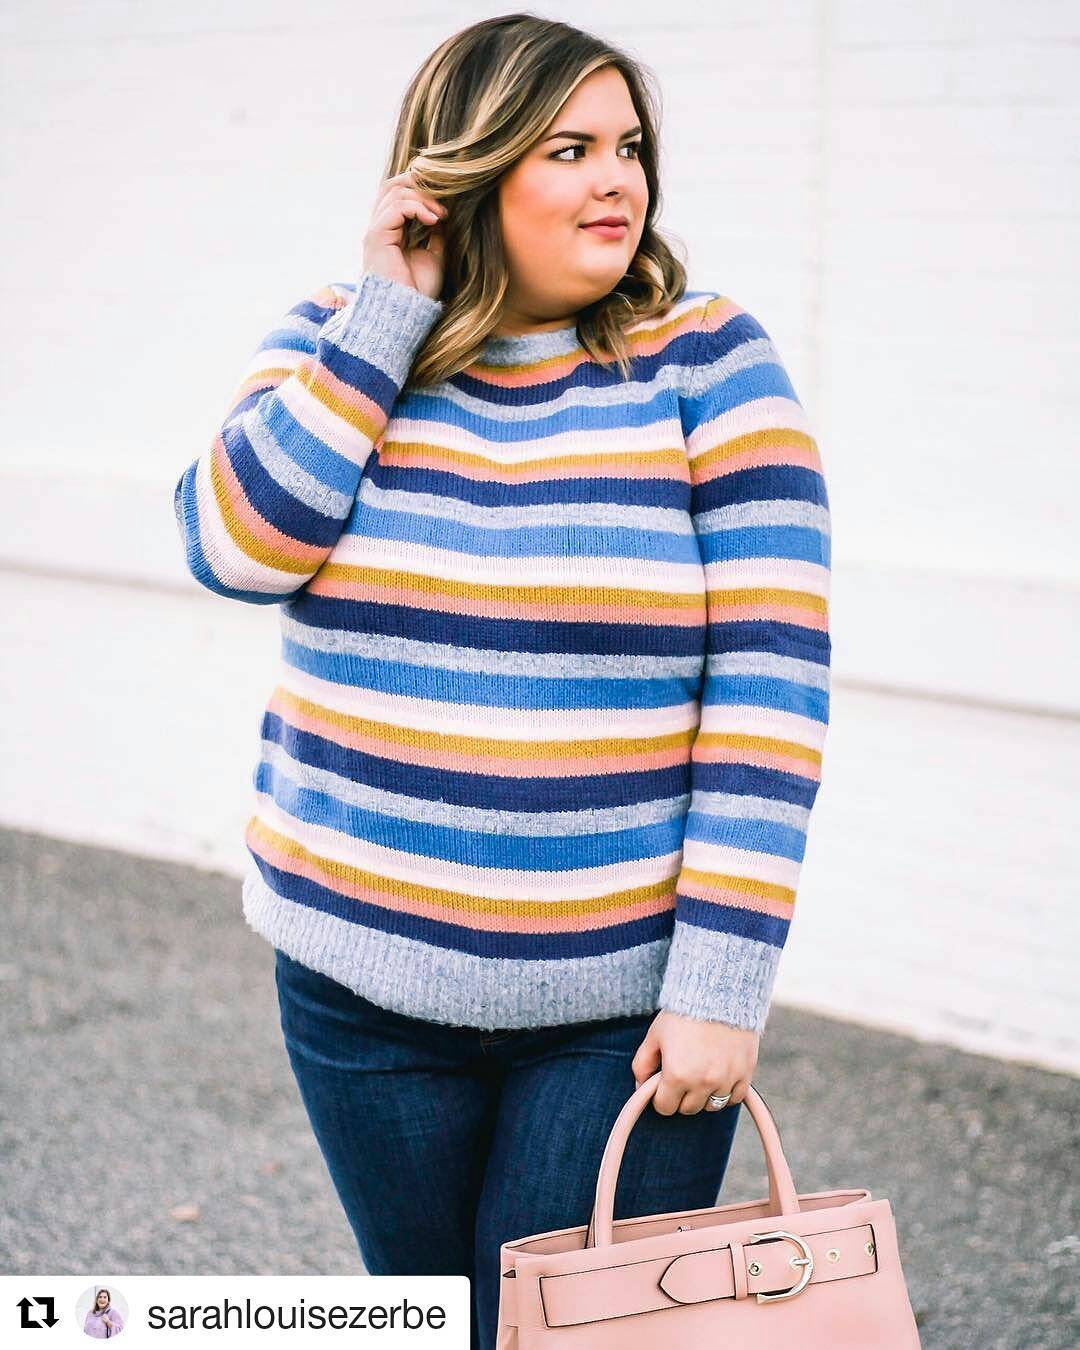 Elegant Stripes Sweater With Denim Jeans